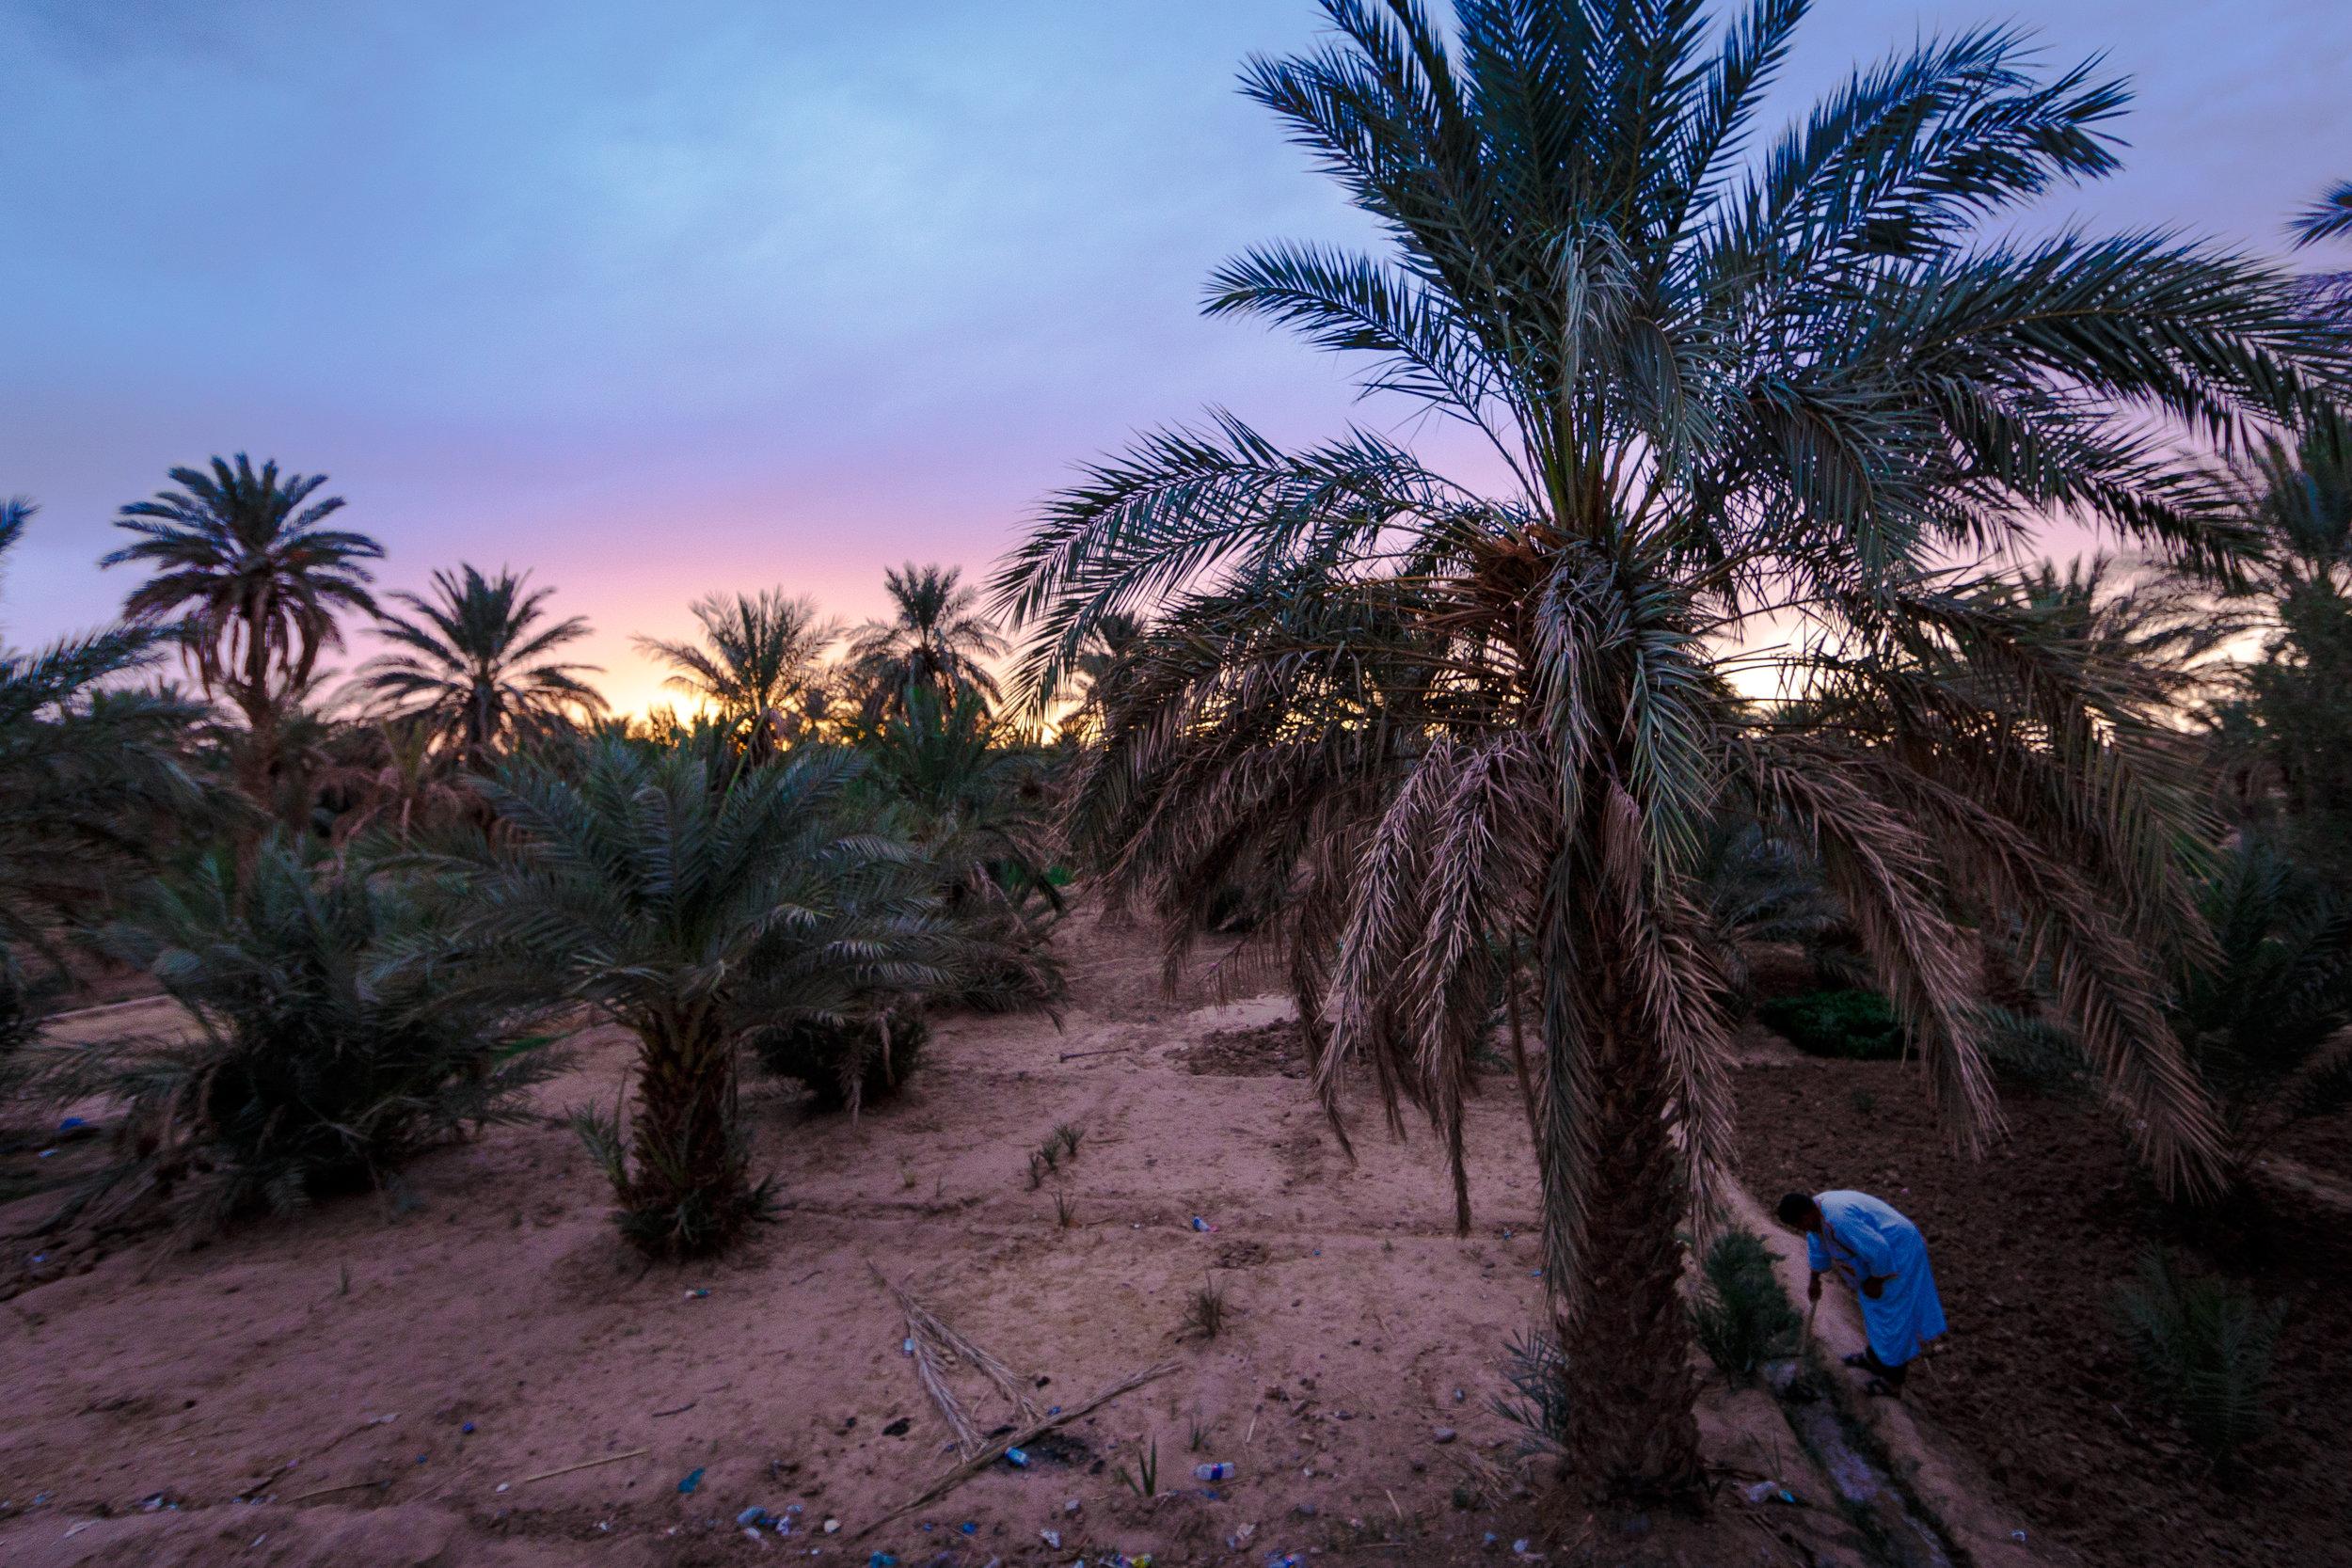 Sun setting on the desert palms of Merzouga.